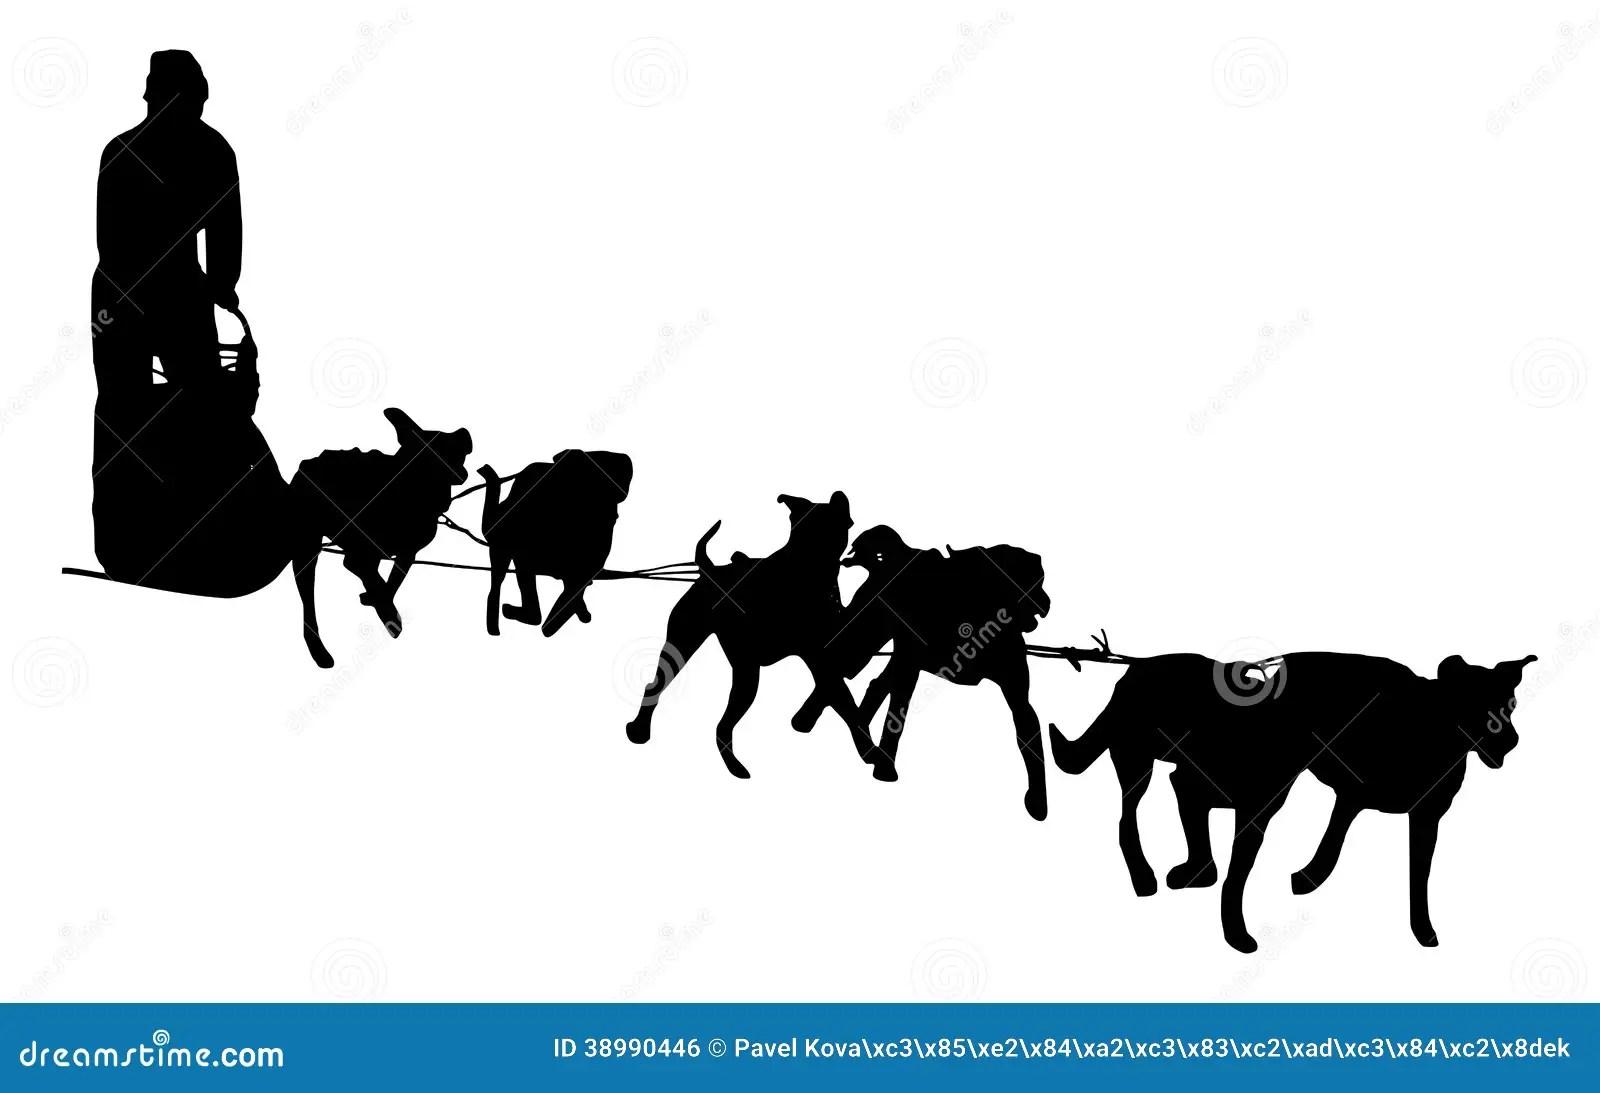 hight resolution of dog sled silhouette on a white background illustration of a dog sledding stock illustration